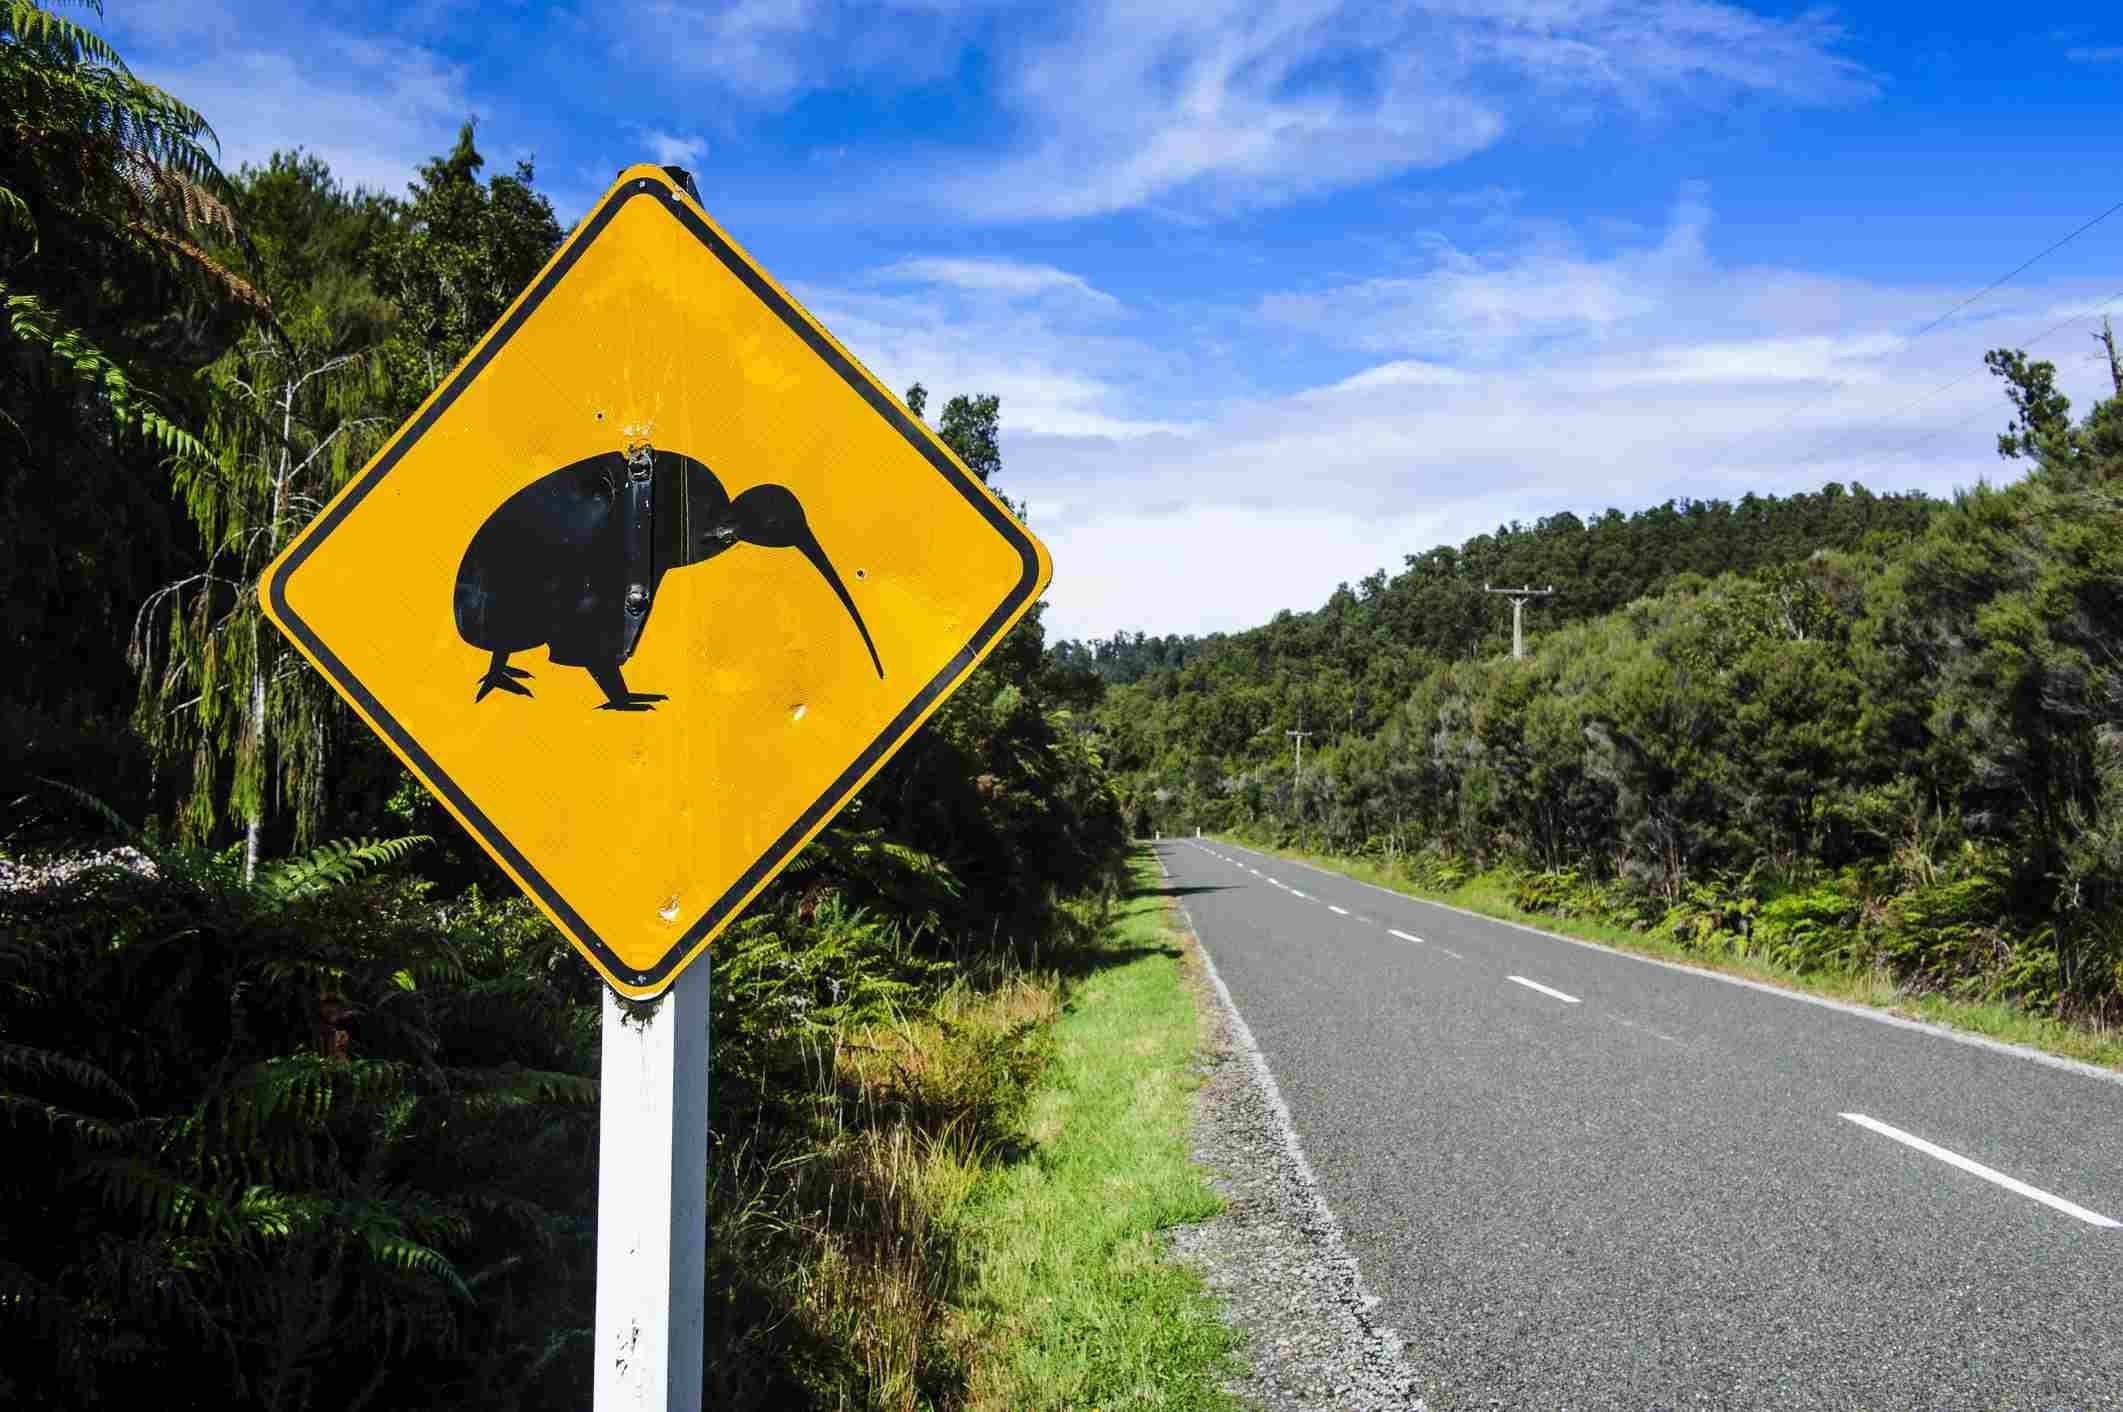 Kiwi warning sign along the road between Fox Glacier and Greymouth, South Island, New Zealand